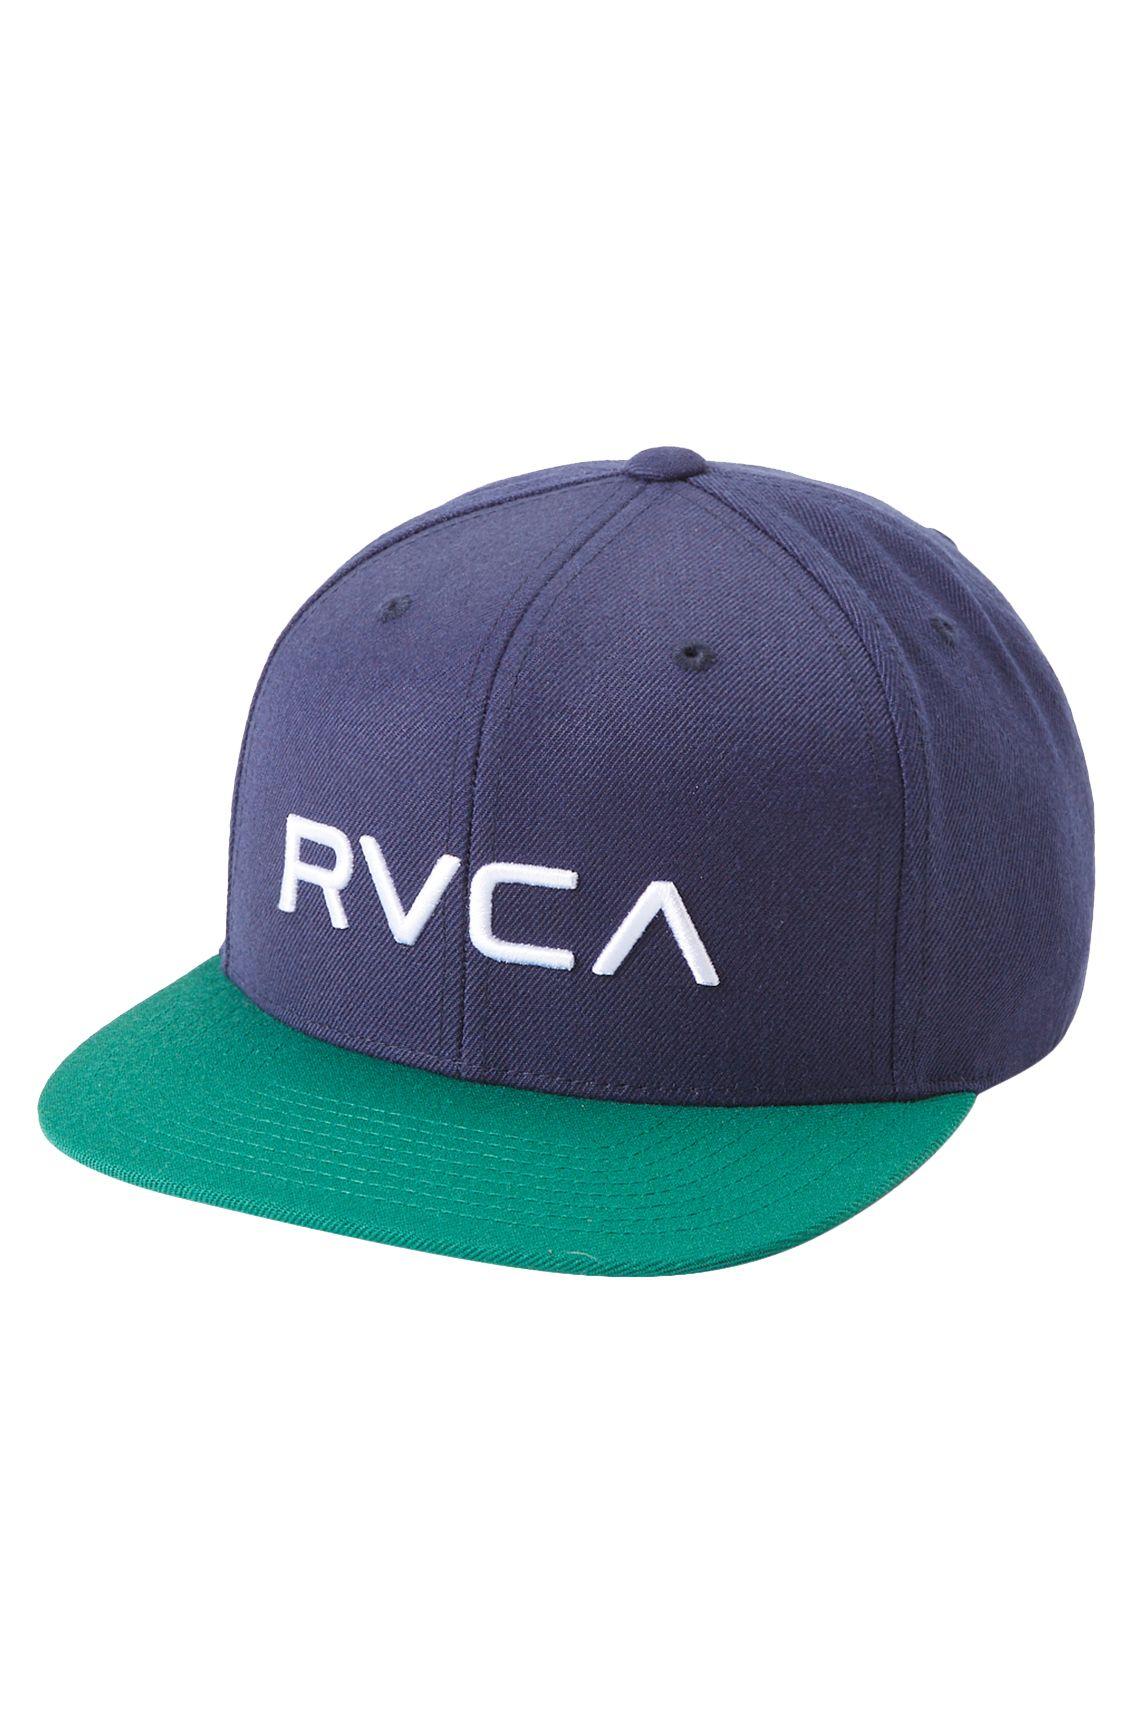 RVCA Cap   RVCA TWILL SNAPBACK Navy/Green